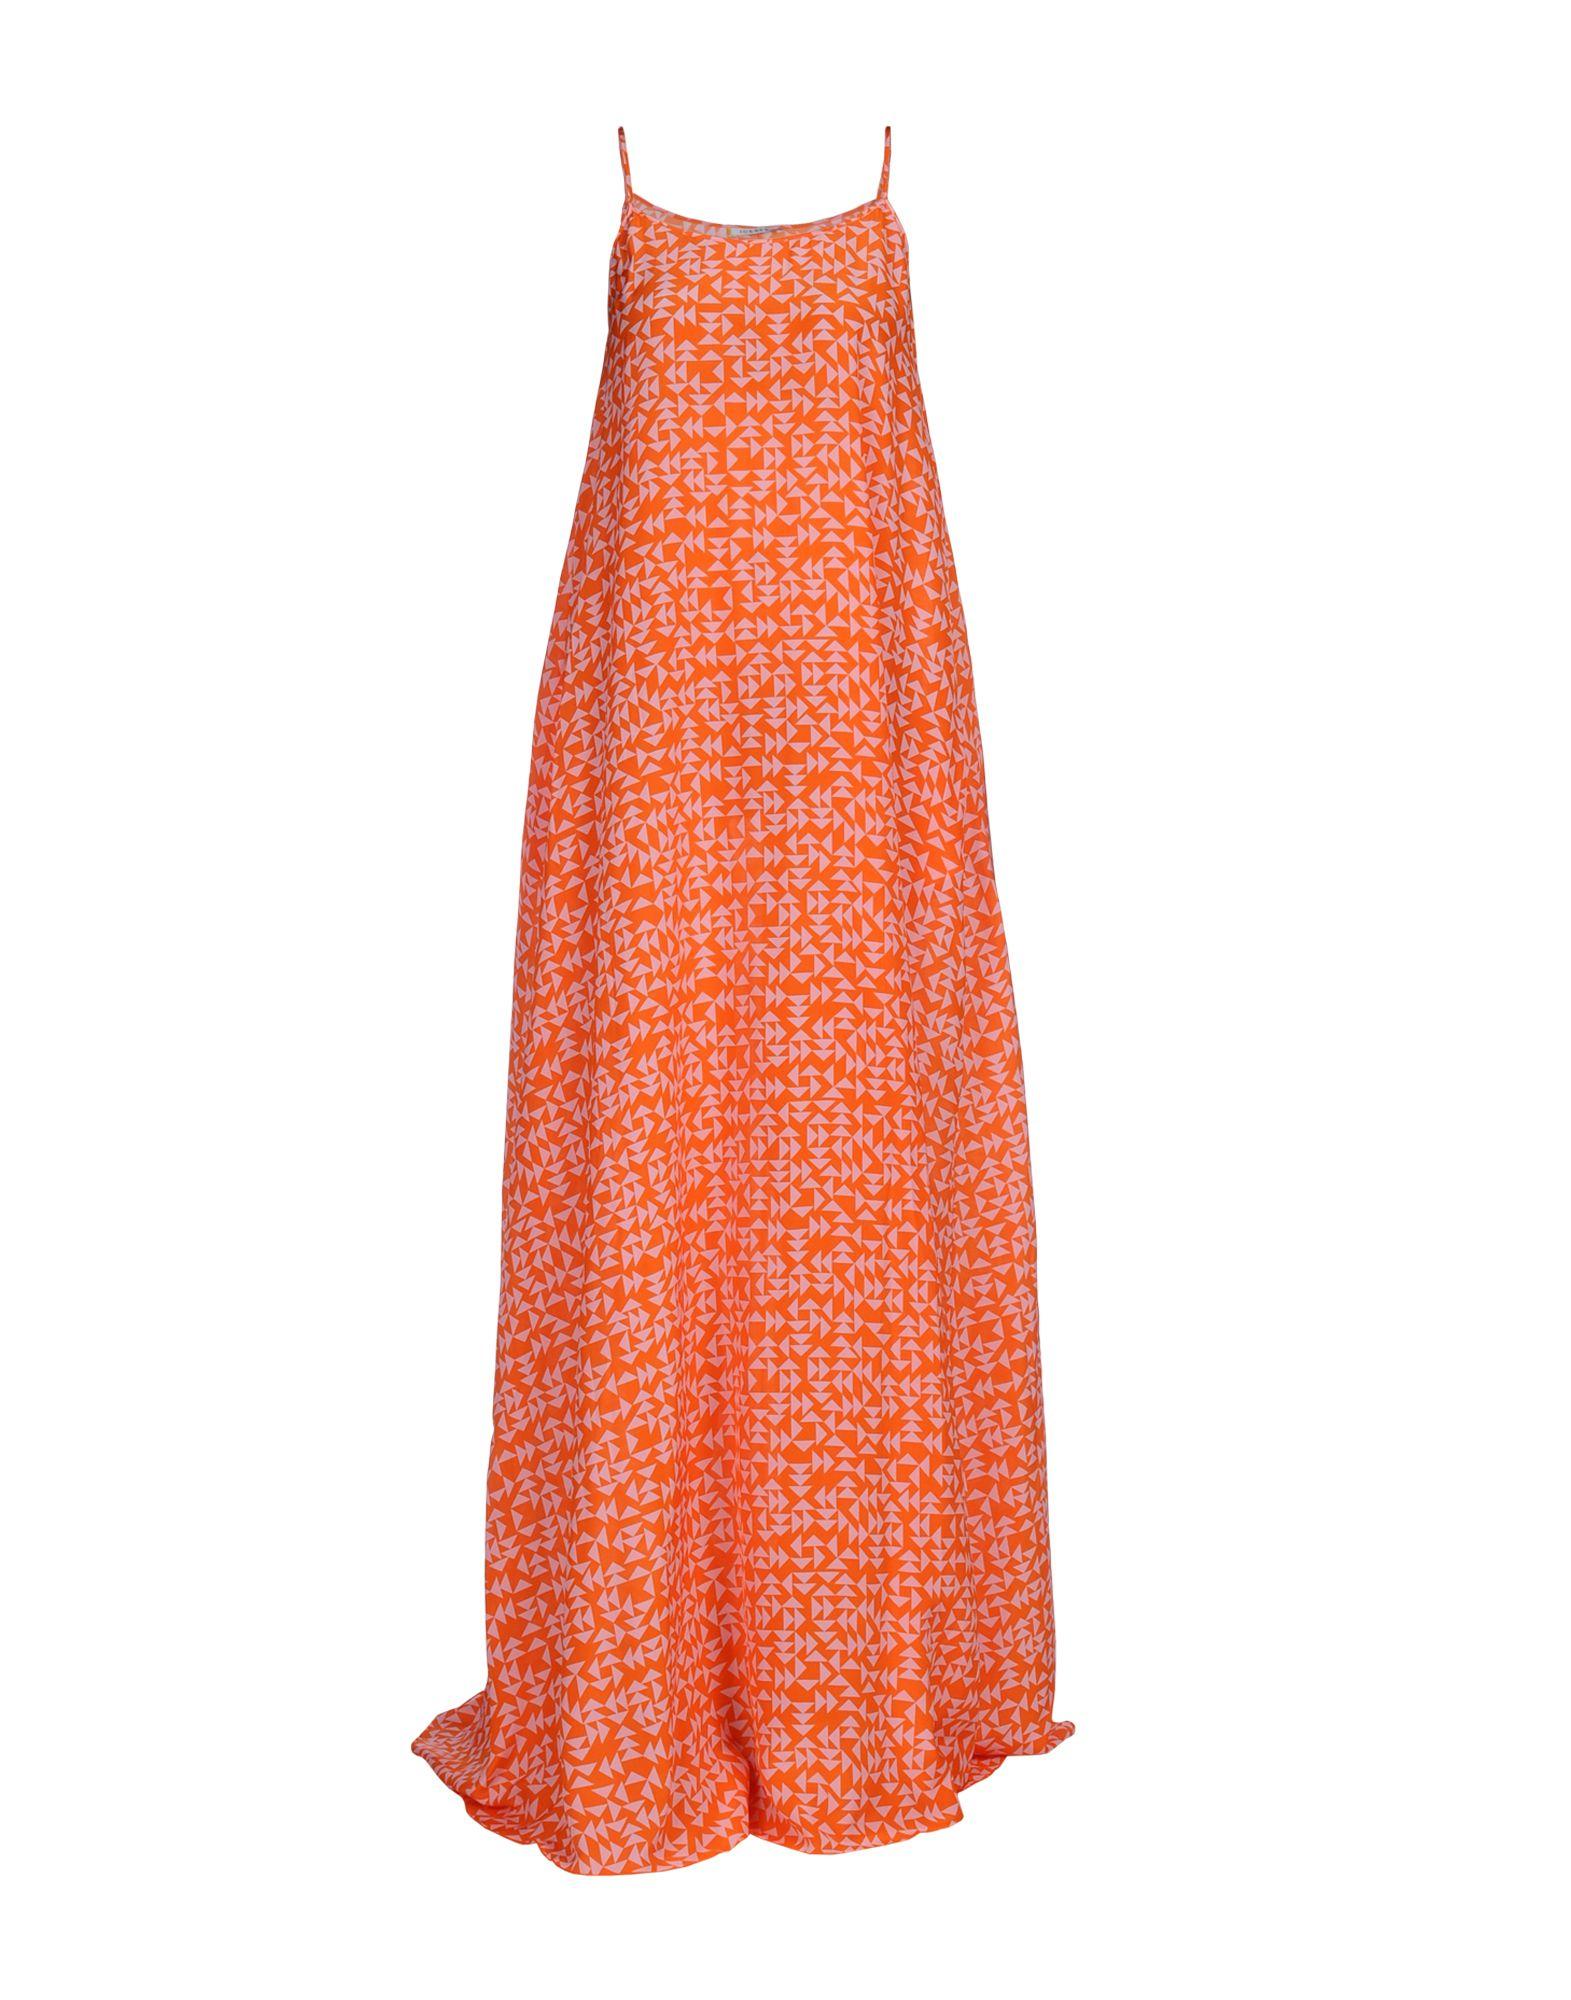 ICEBERG Длинное платье clio peppiatt длинное платье